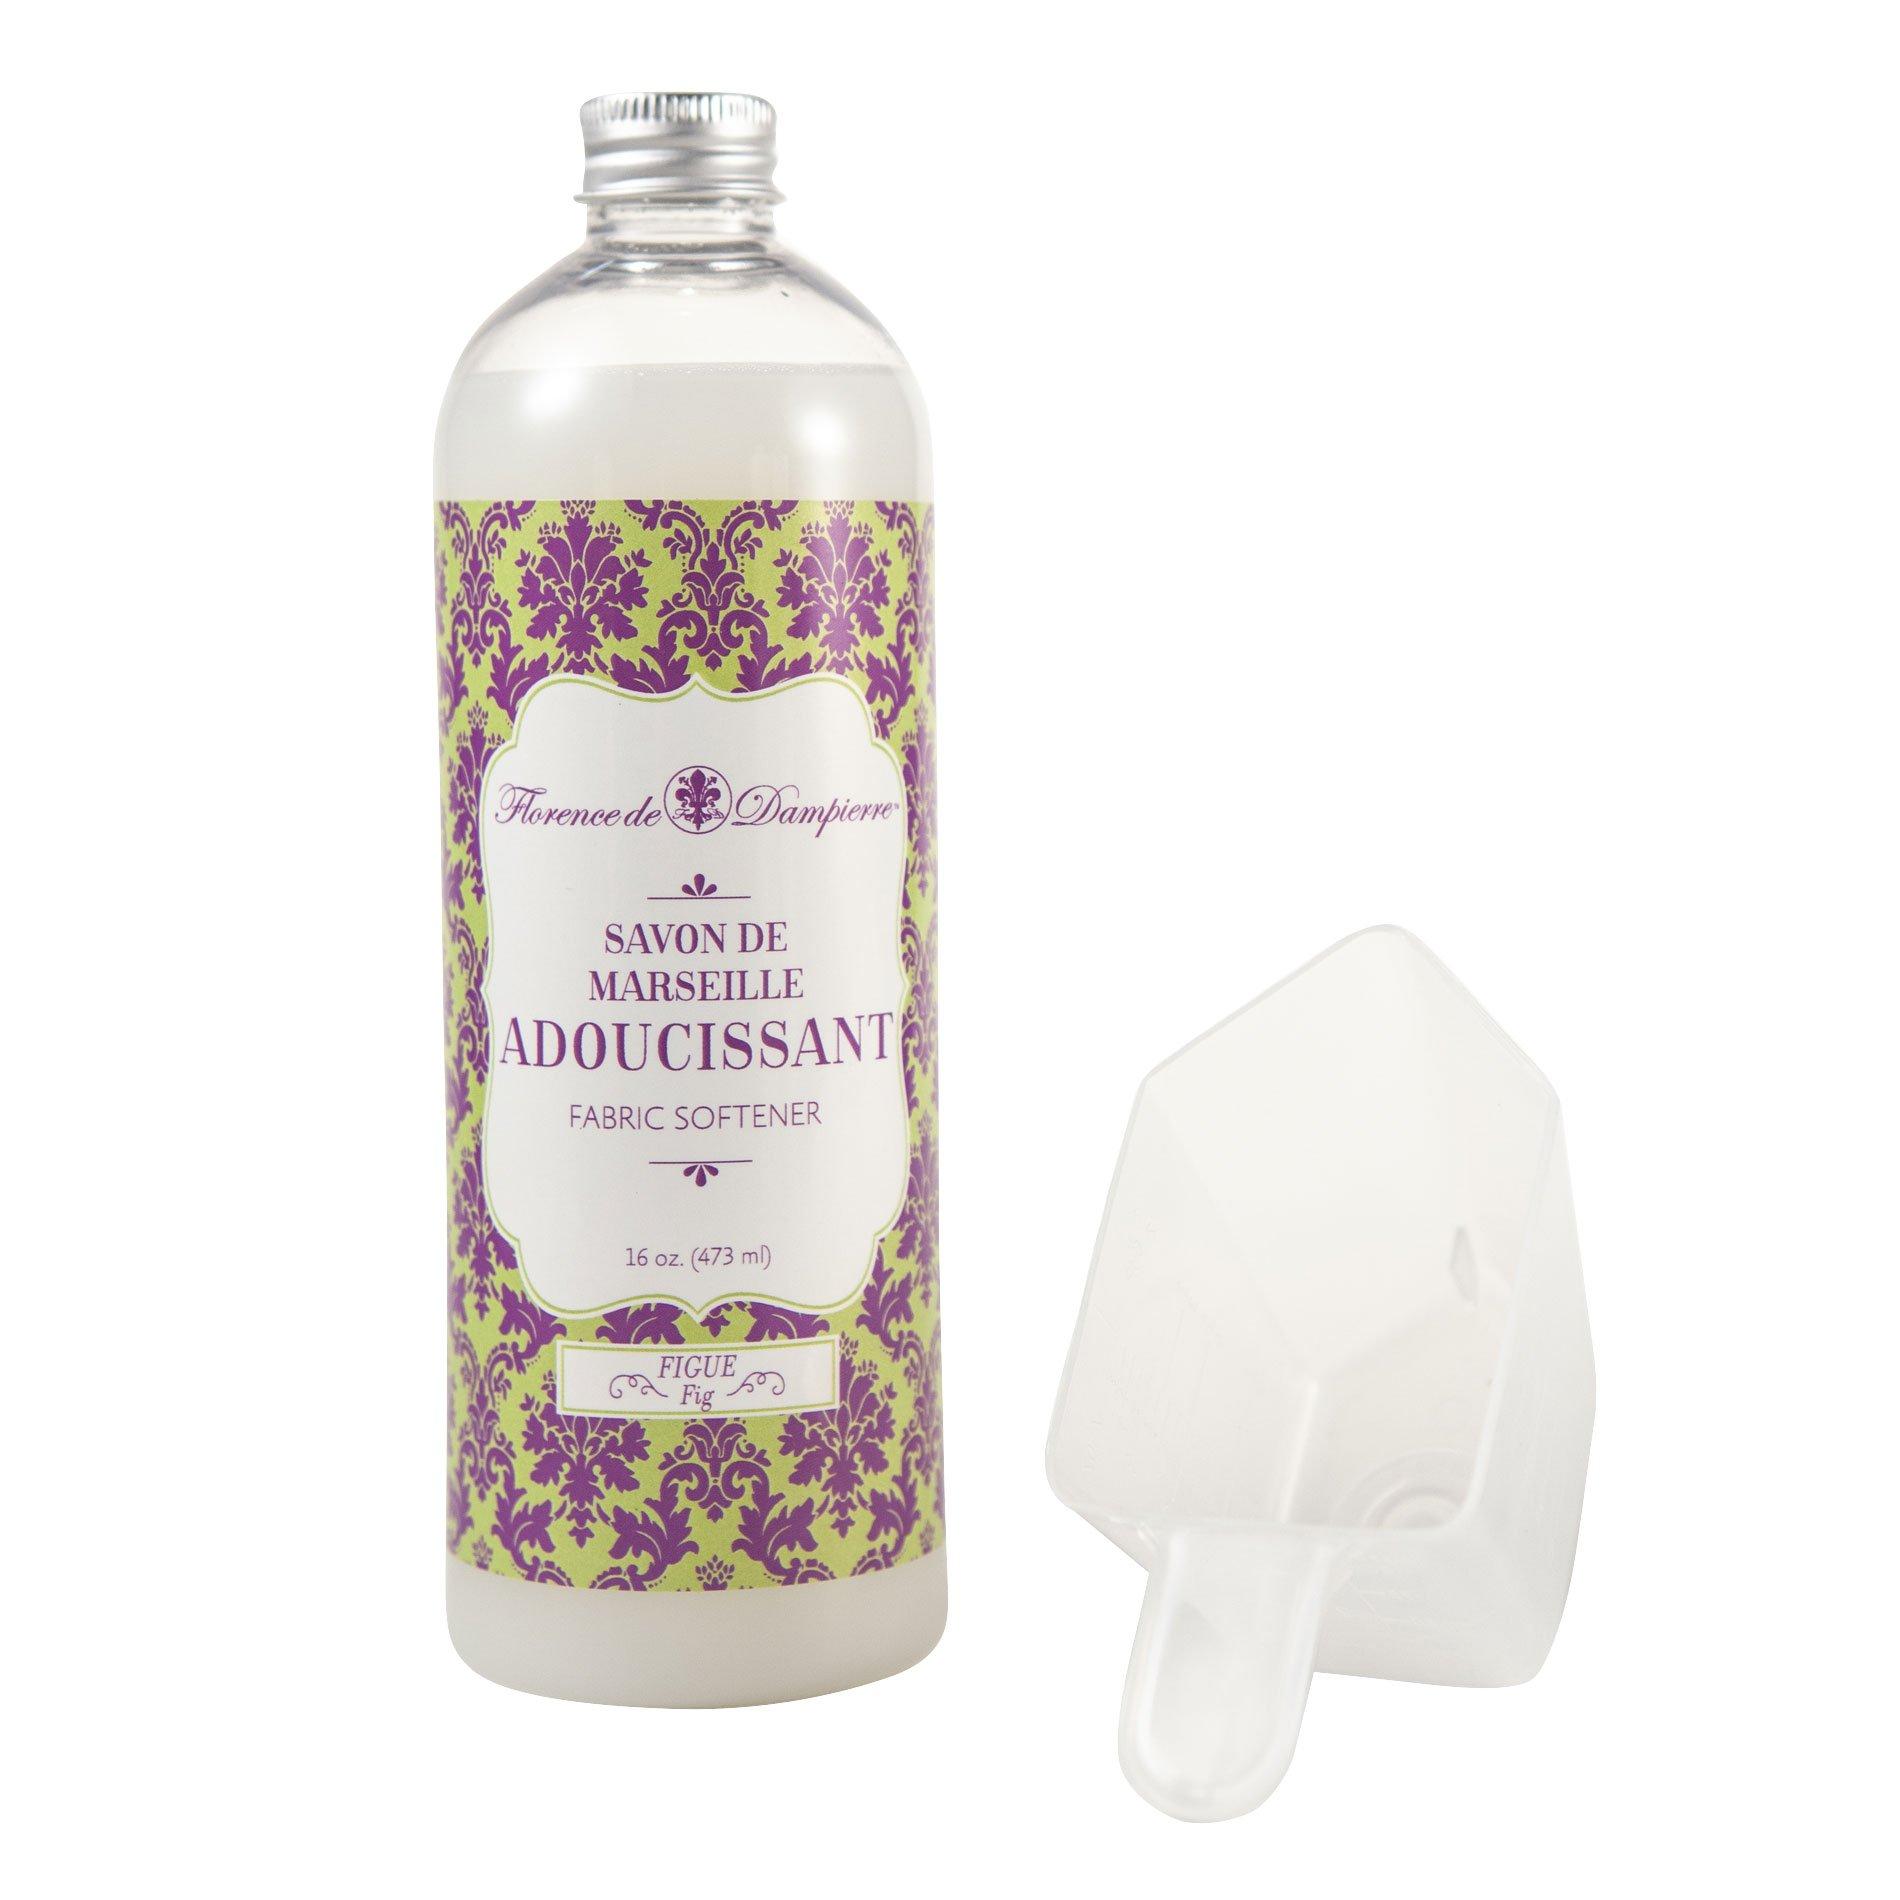 Florence de Dampierre All-Natural Savon de Marseille Soap, Concentrated Liquid Fabric Softener, 16 oz. - Fig